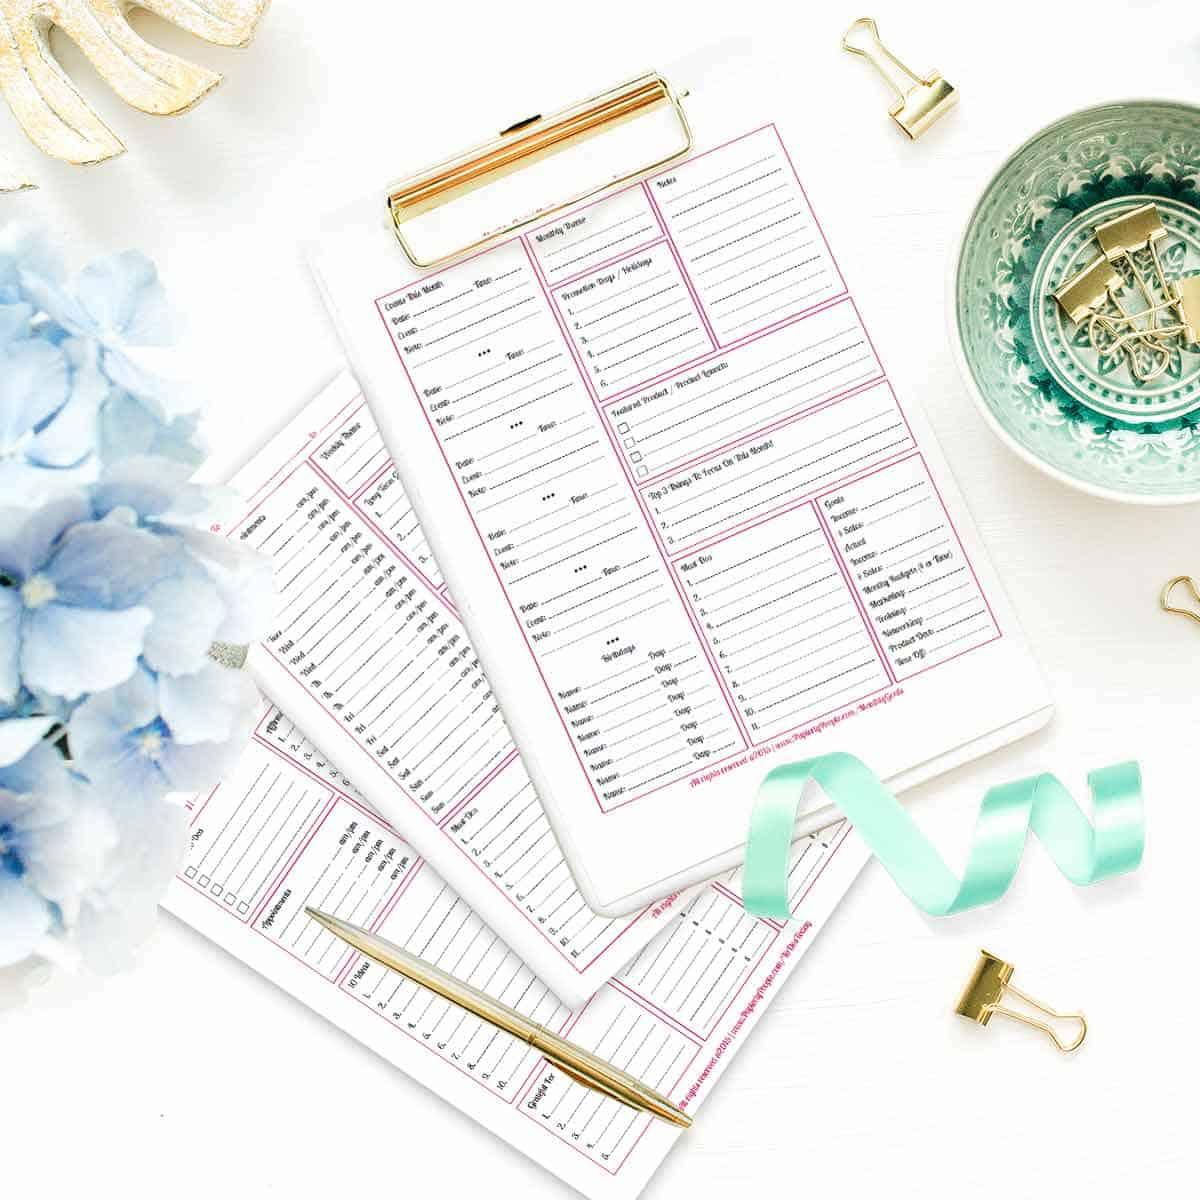 Printable Planner Calendar System For Staples Arc System Or